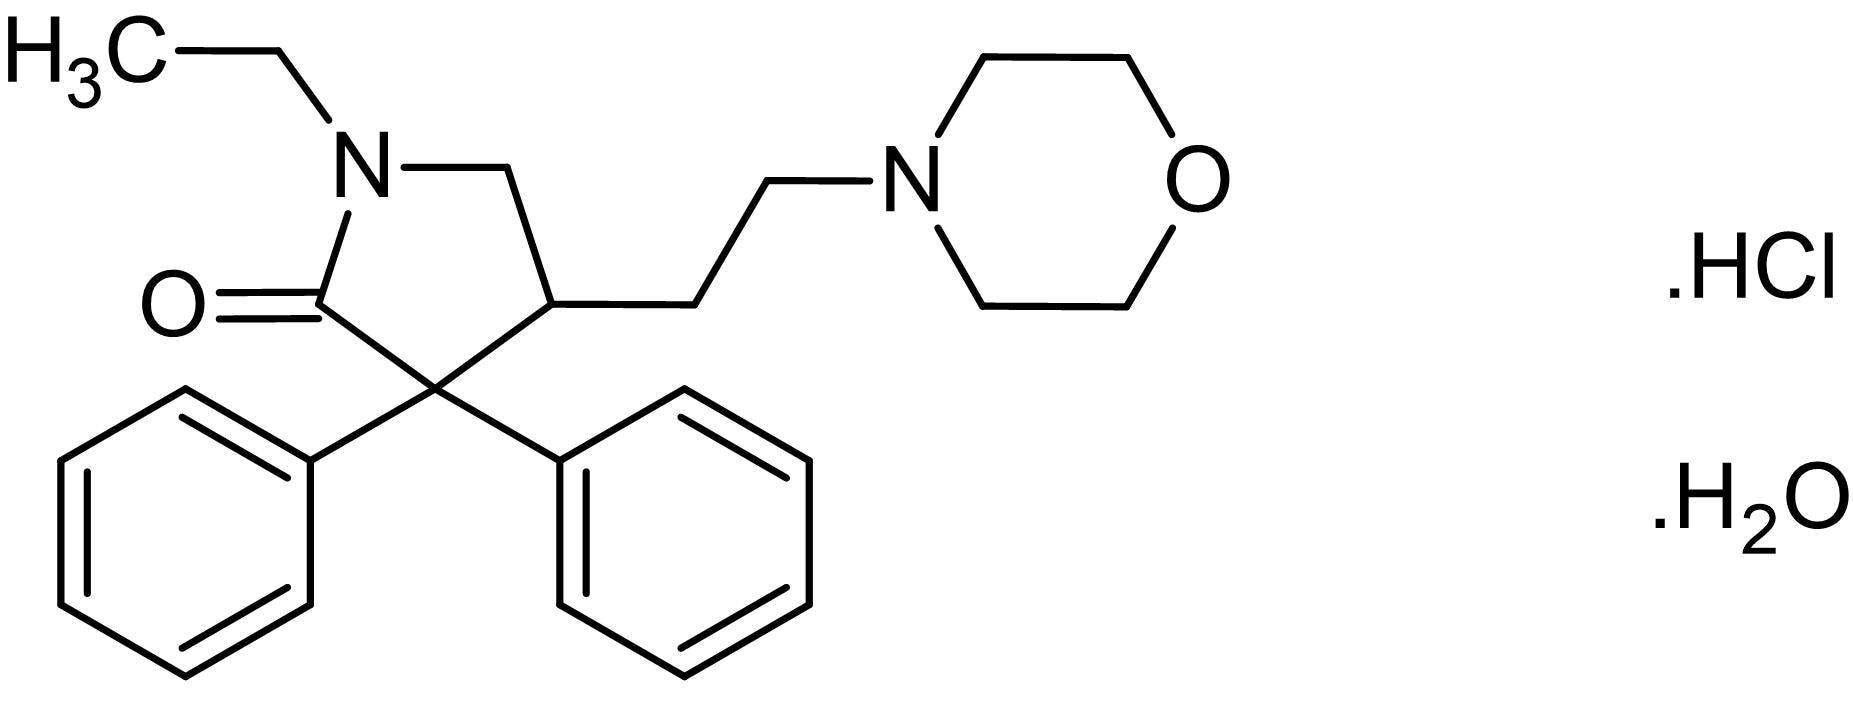 Chemical Structure - Doxapram hydrochloride monohydrate, K+ channel blocker (ab142751)